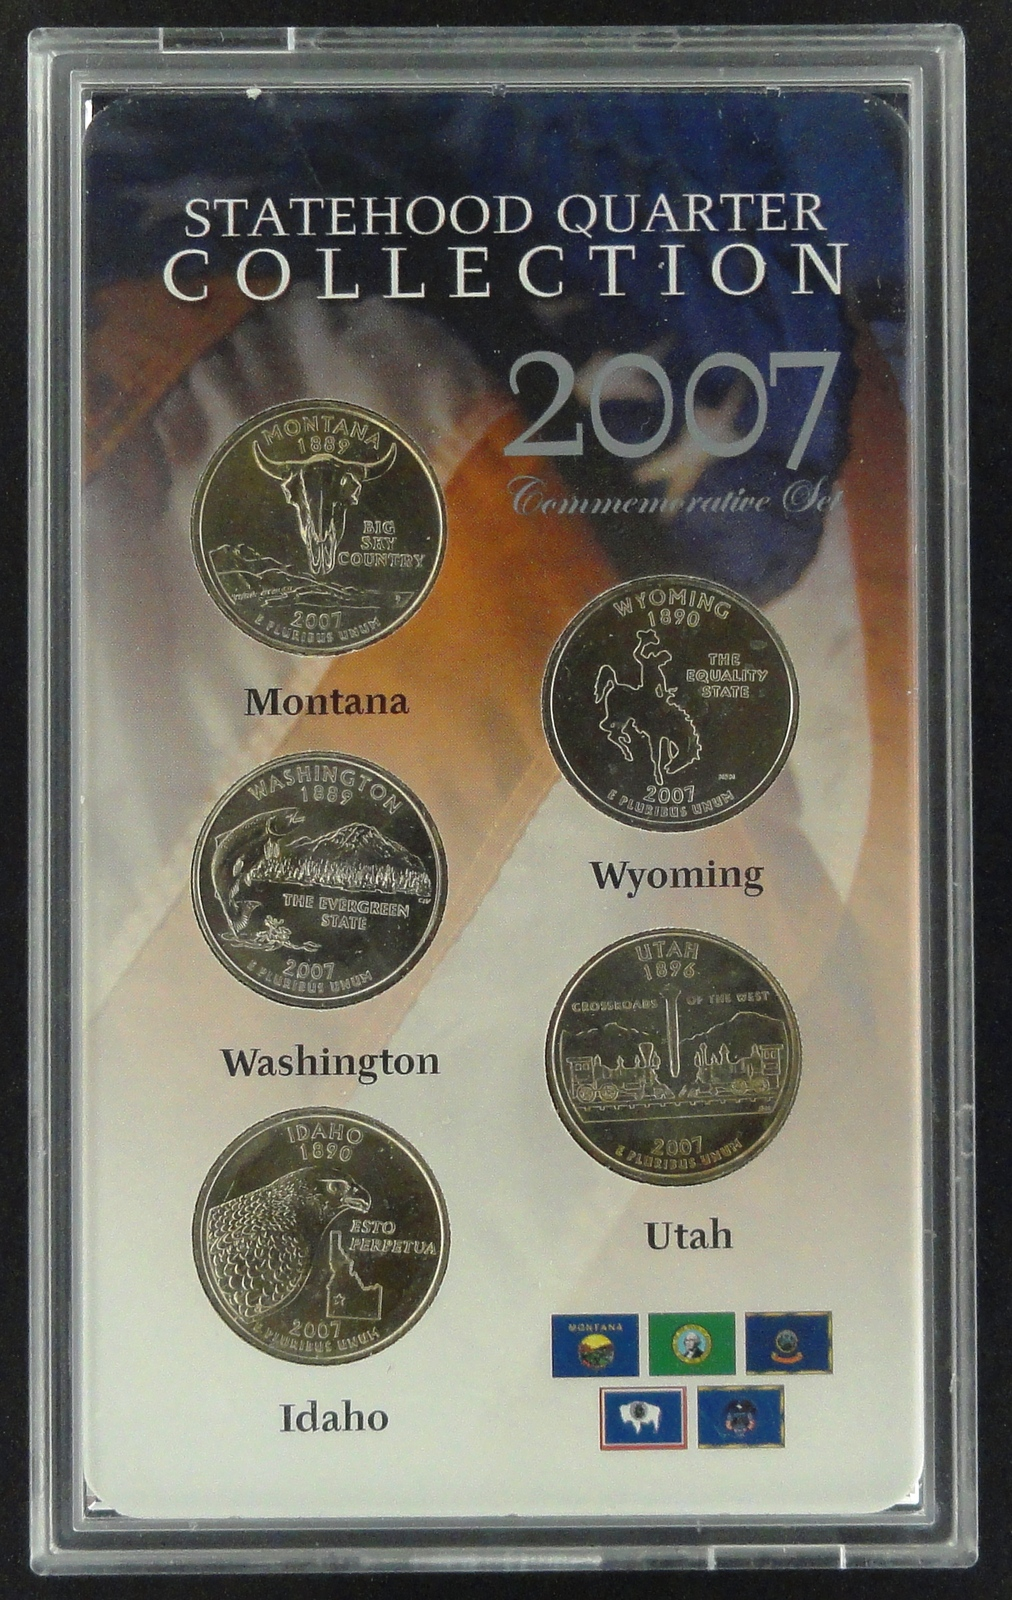 2007 Statehood Quarter Collection Commemorative Set - $7.50